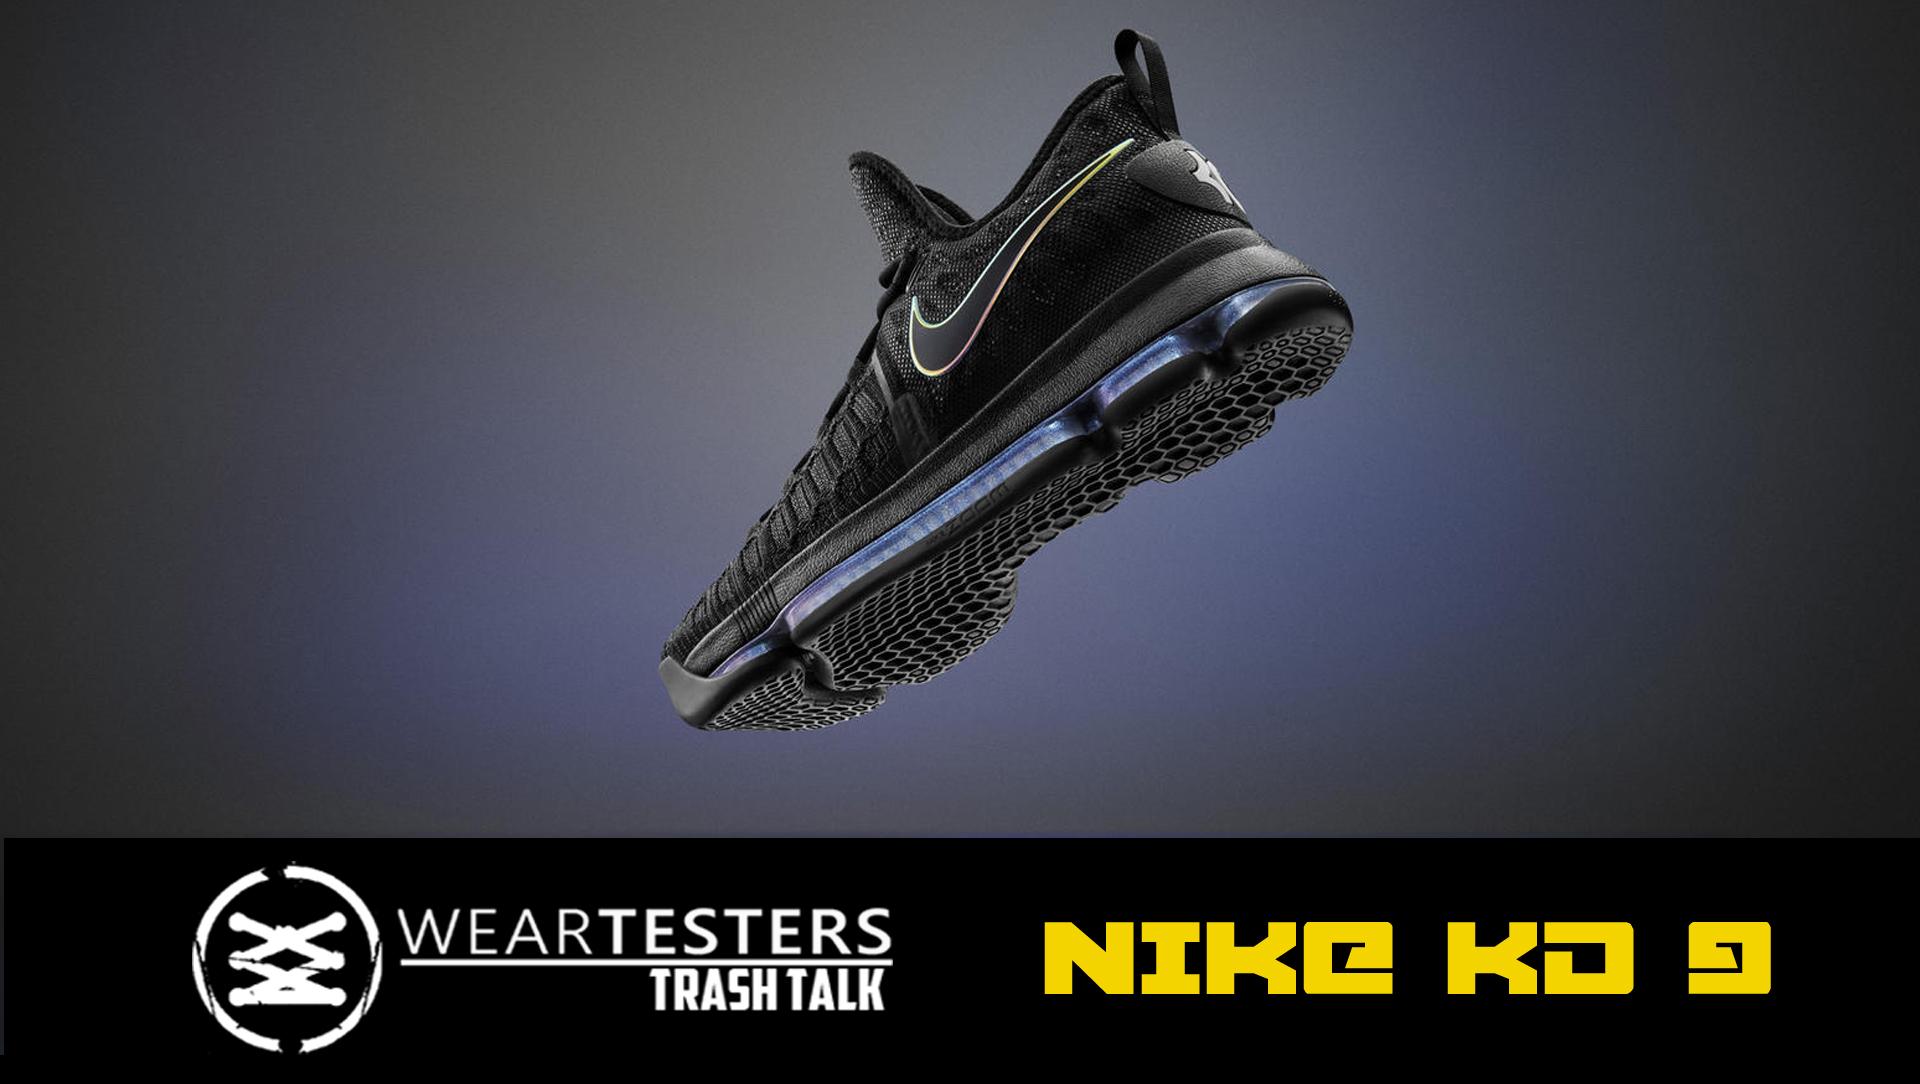 KD 9 Trash Talk – Thumbnail